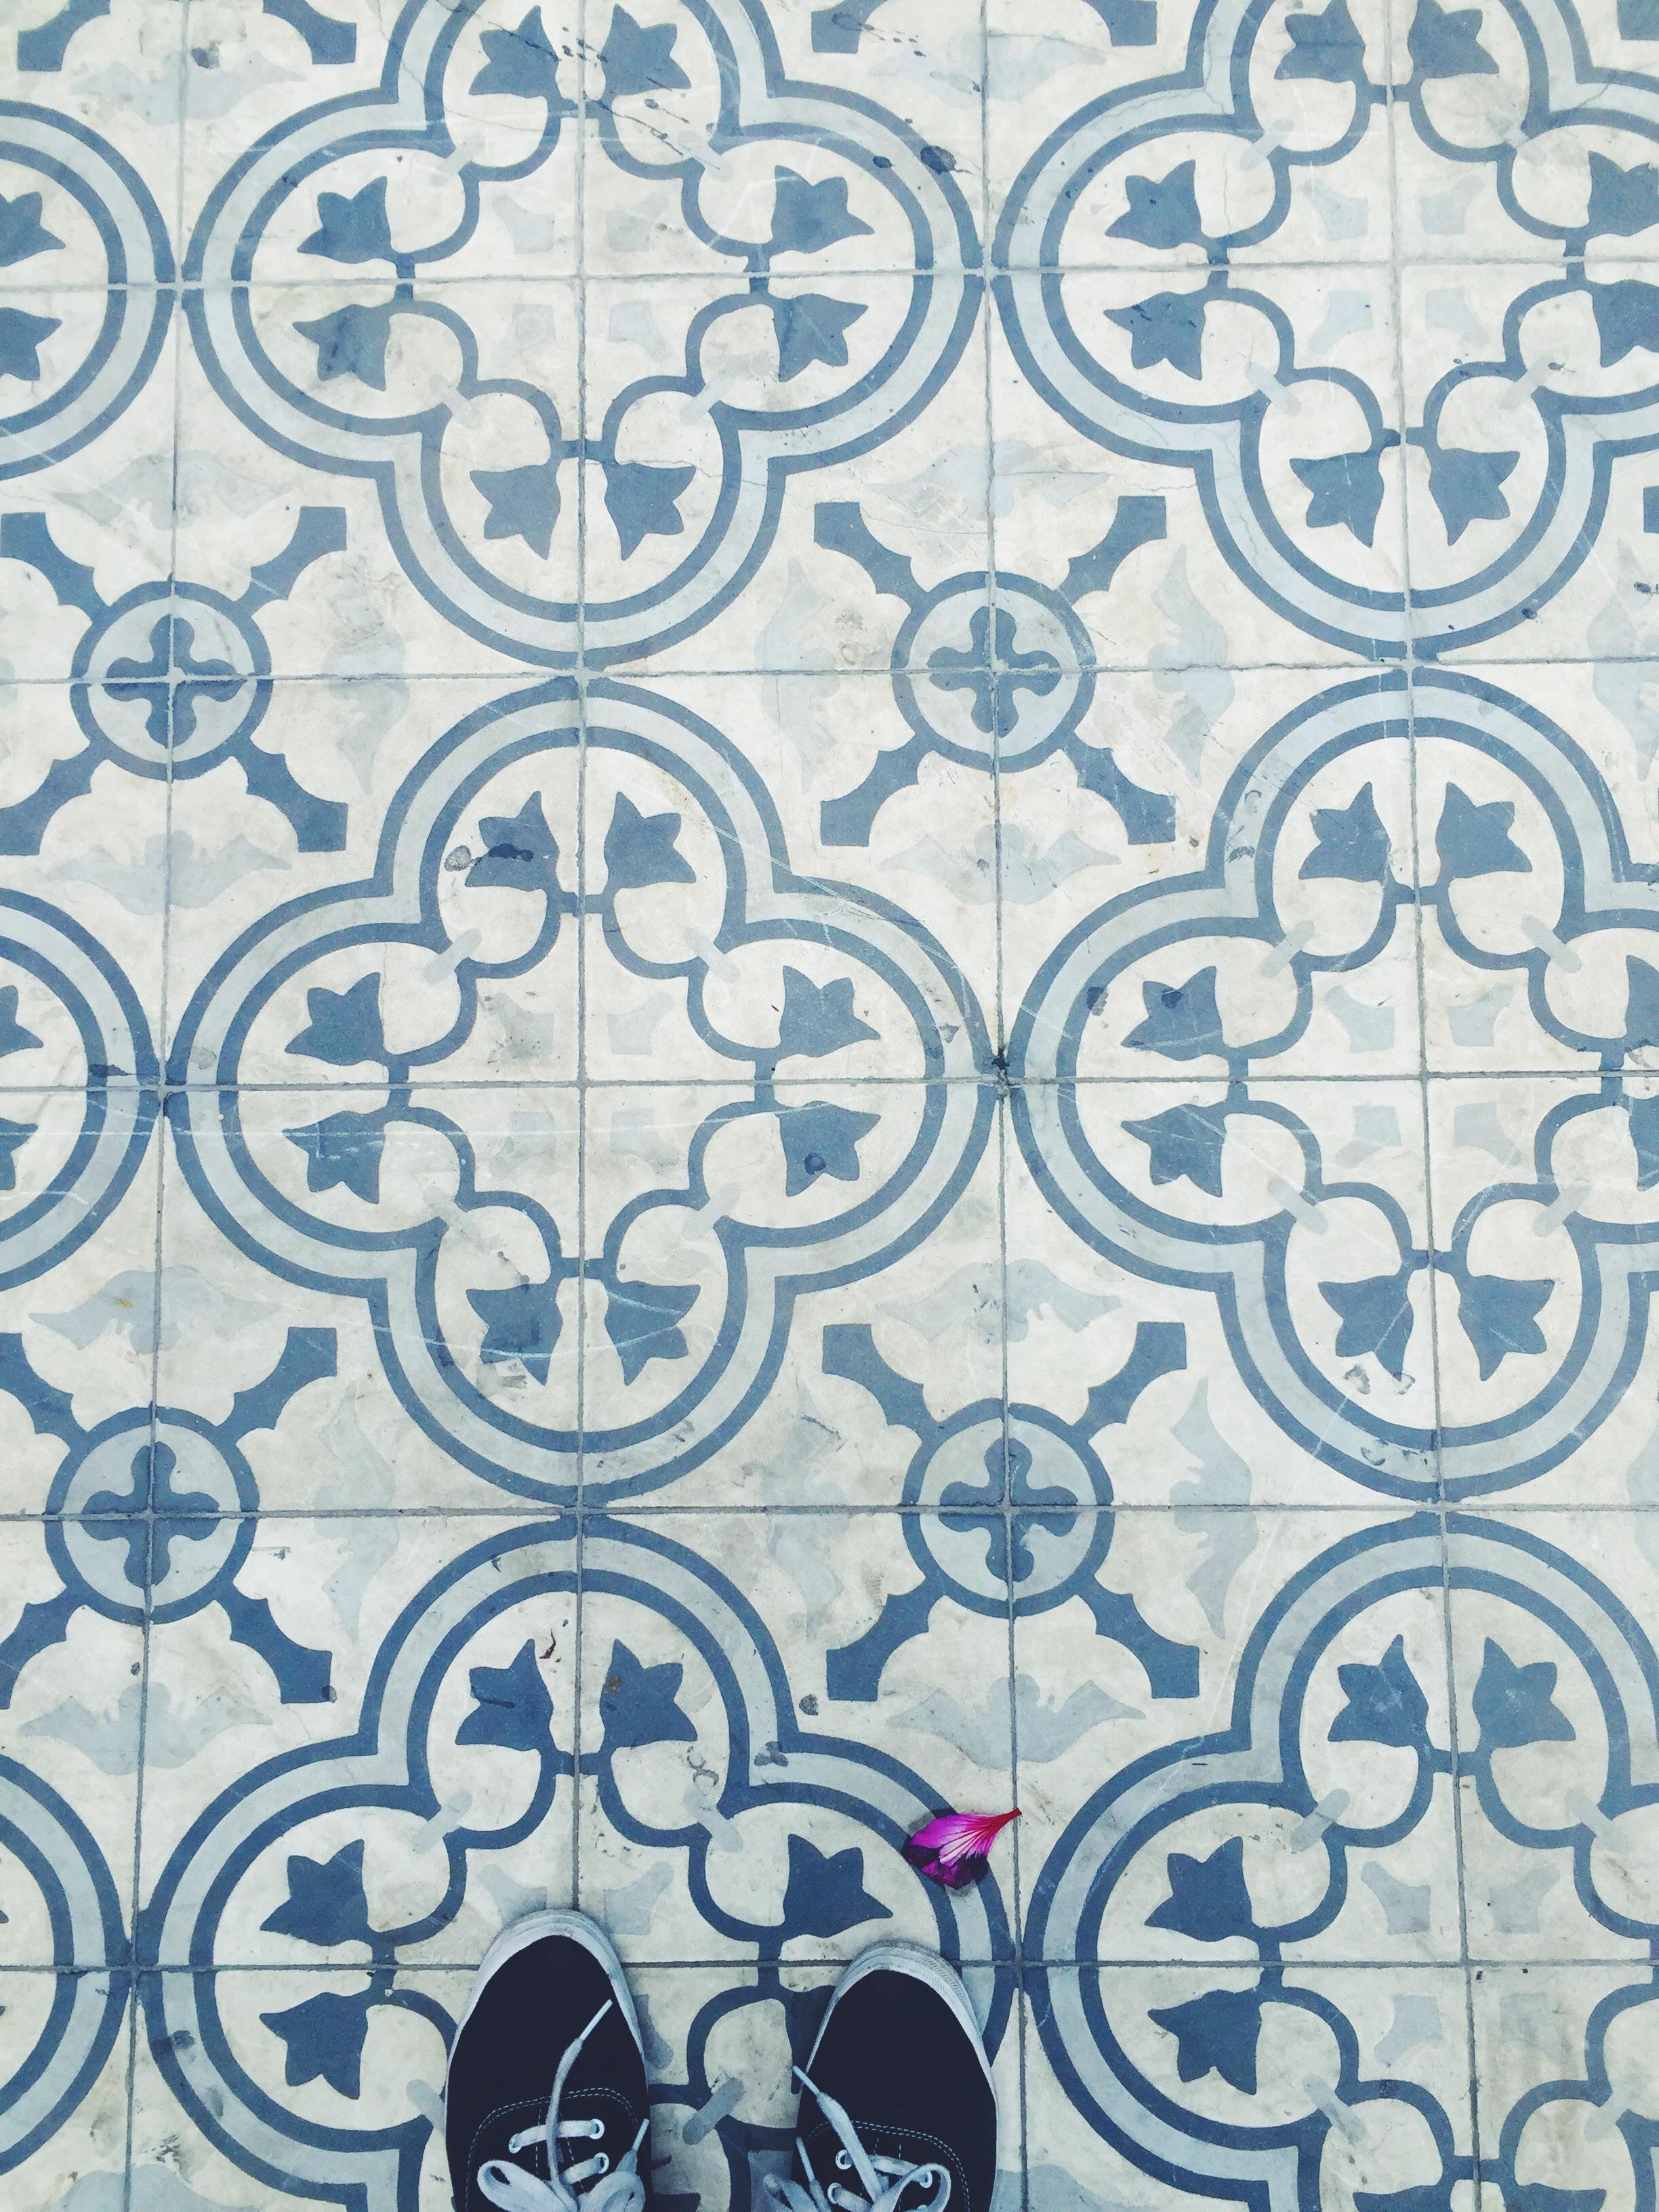 Encaustic tiles in Colonia Roma